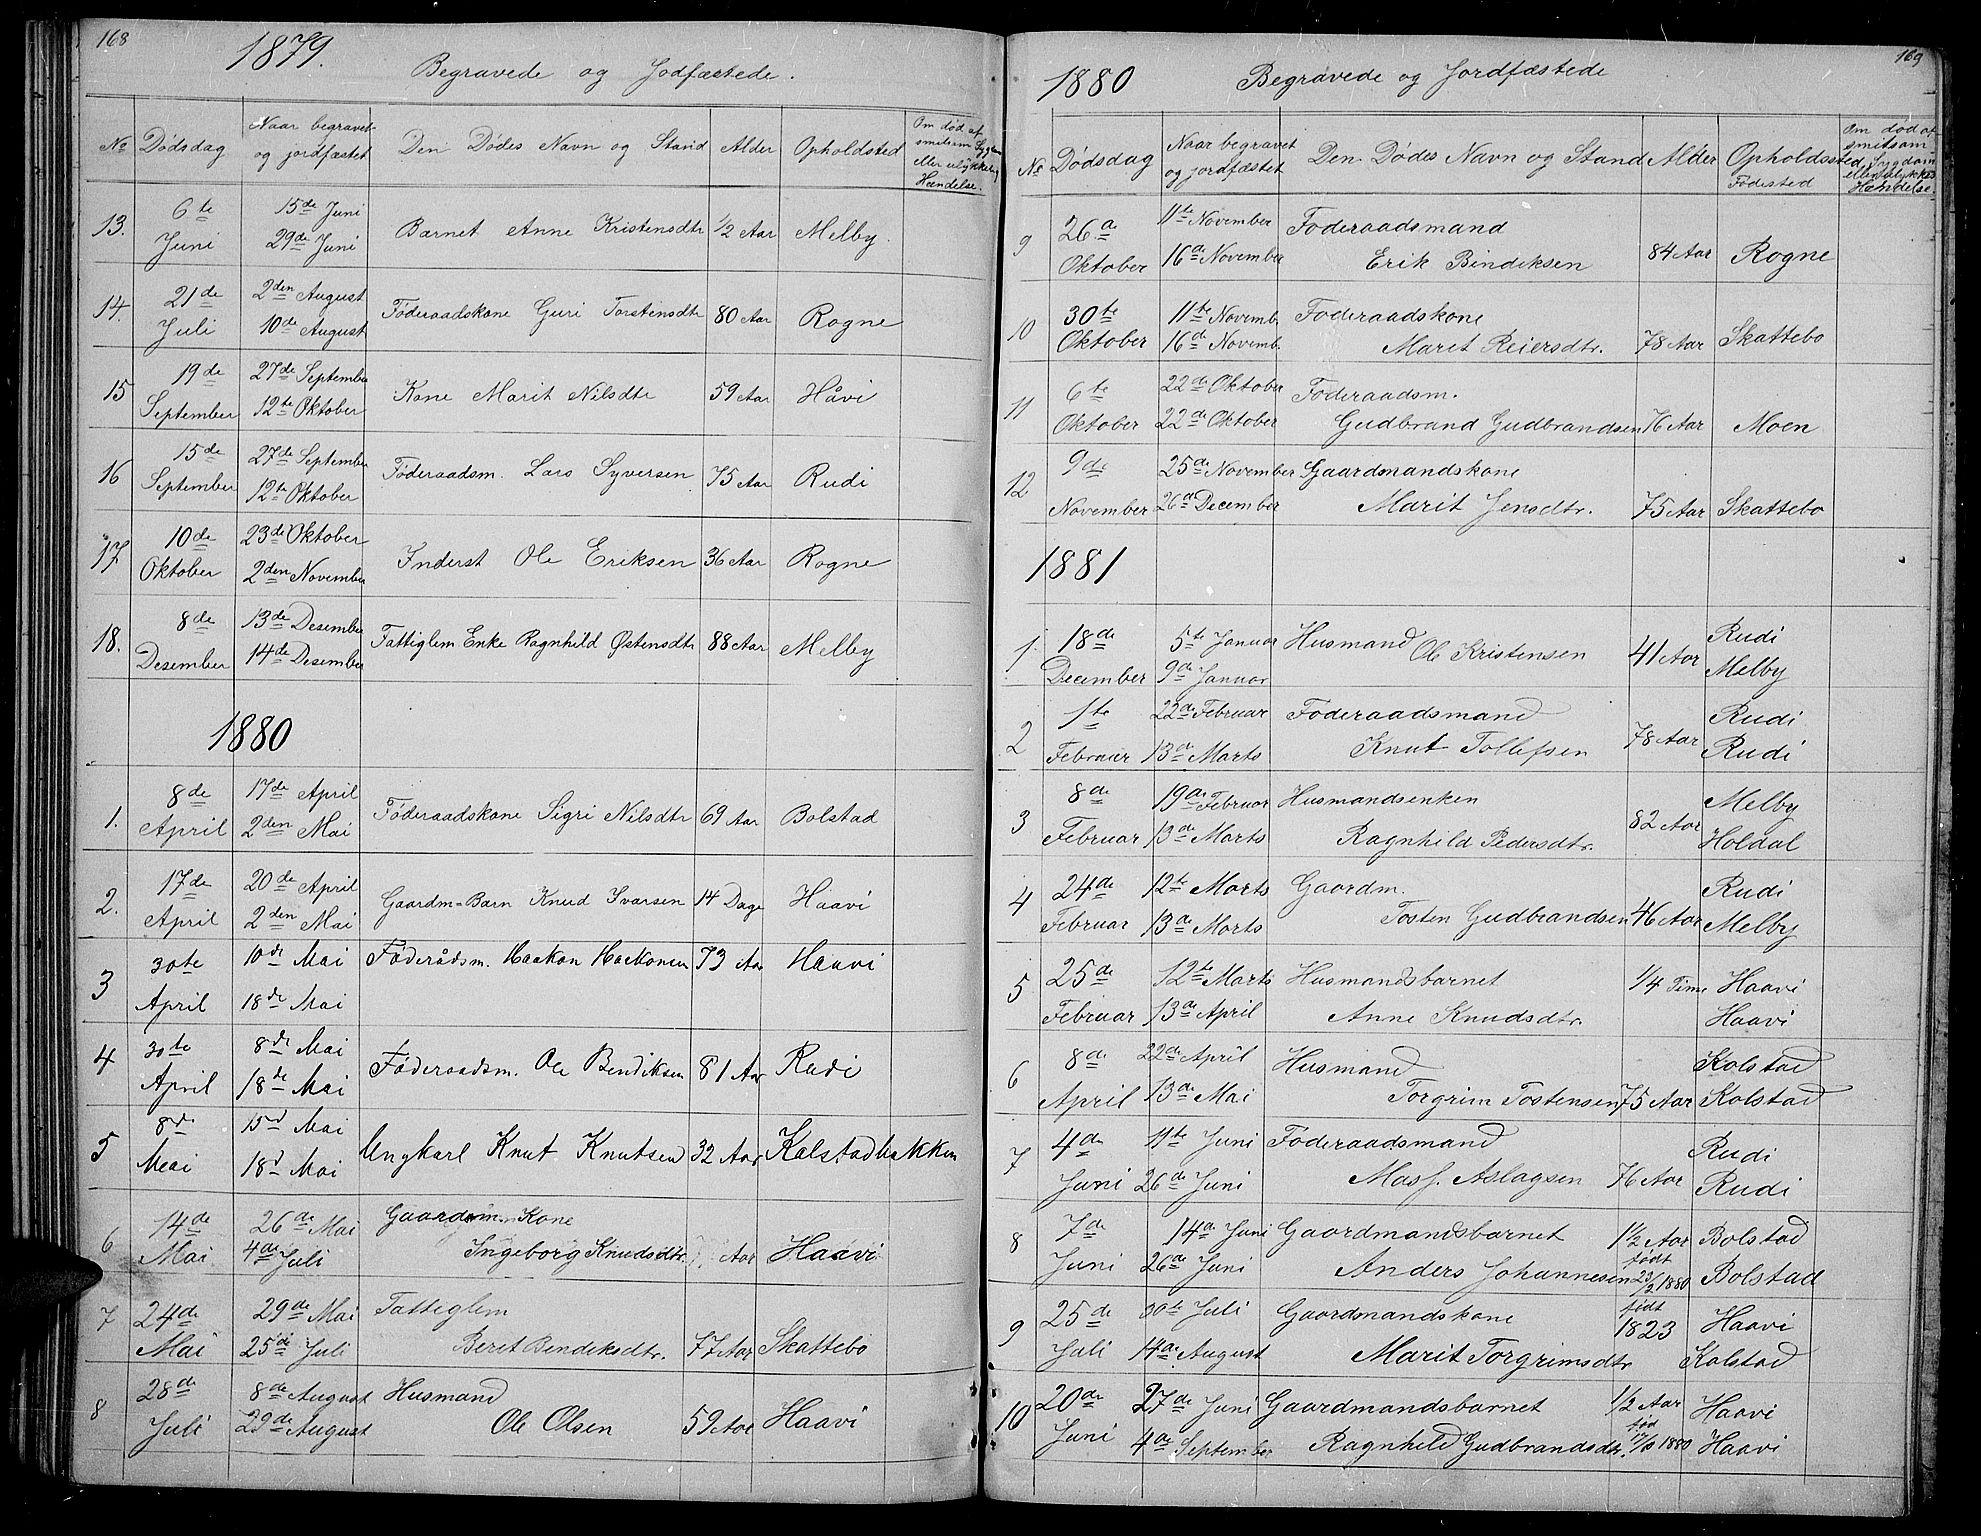 SAH, Øystre Slidre prestekontor, Klokkerbok nr. 3, 1866-1886, s. 168-169